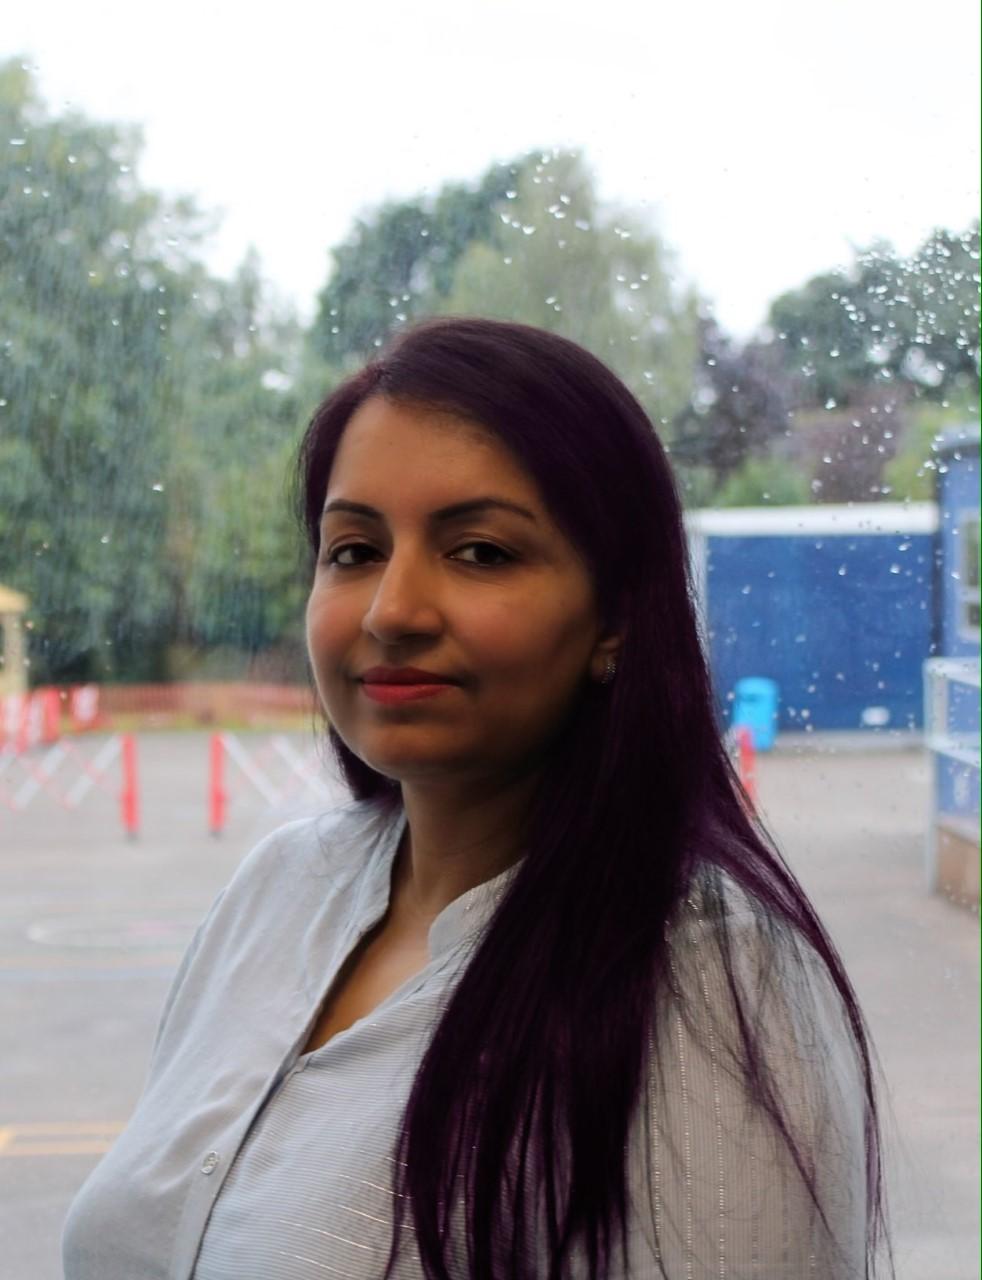 https://www.learningtoshapebirmingham.co.uk/wp-content/uploads/2020/09/Nandini-Gill.jpg